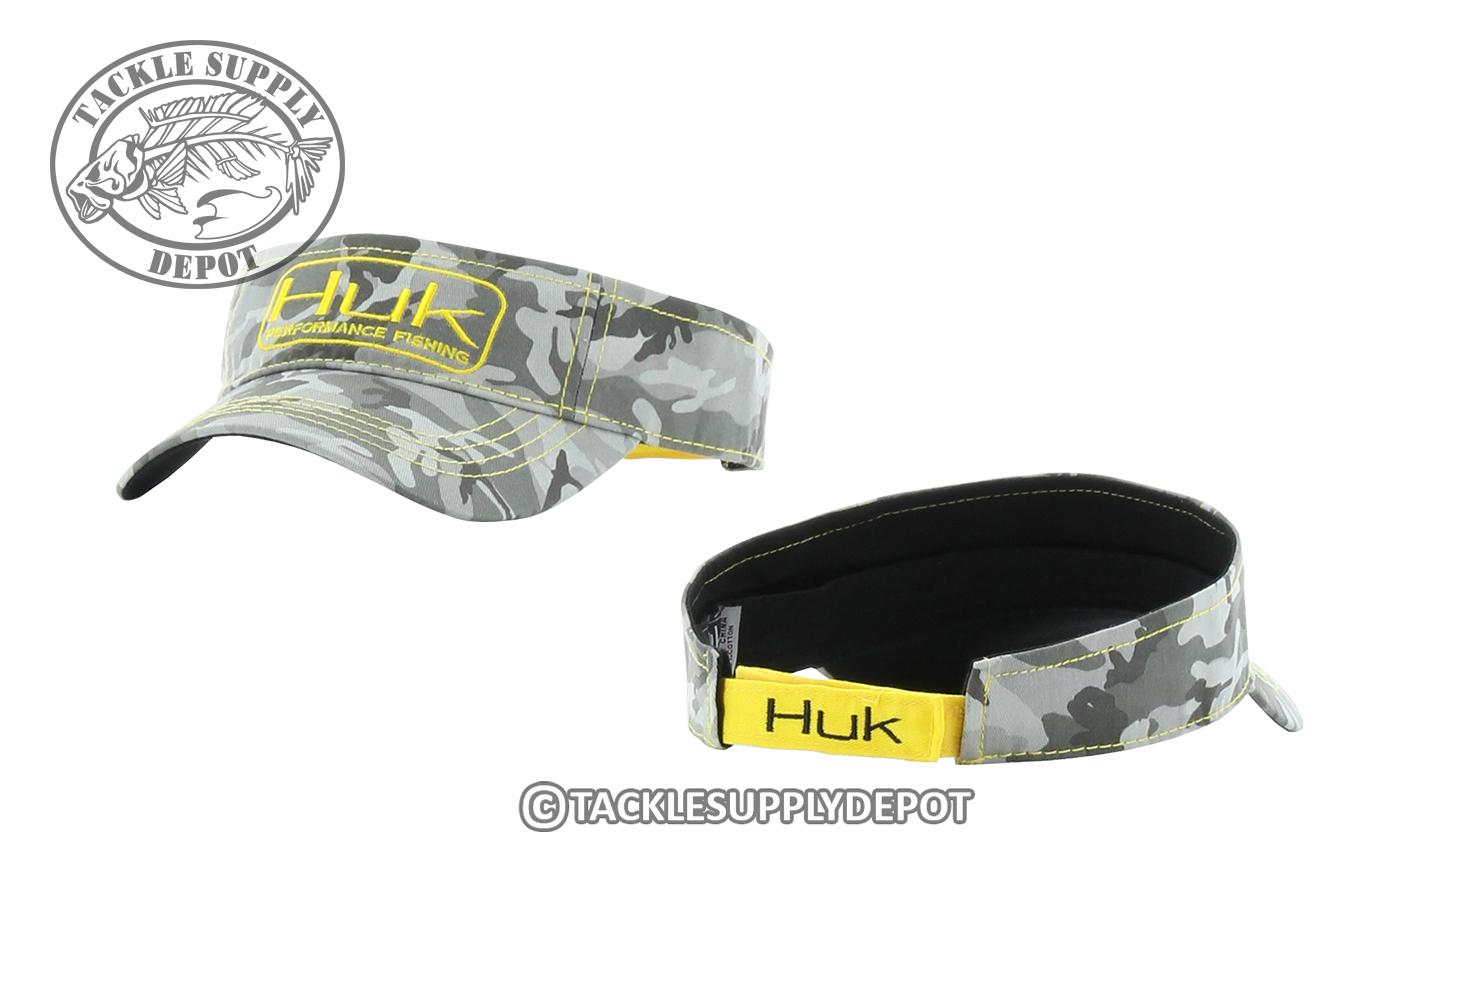 Huk fishing logo camo visor hat see selection ebay for Huk fishing hats